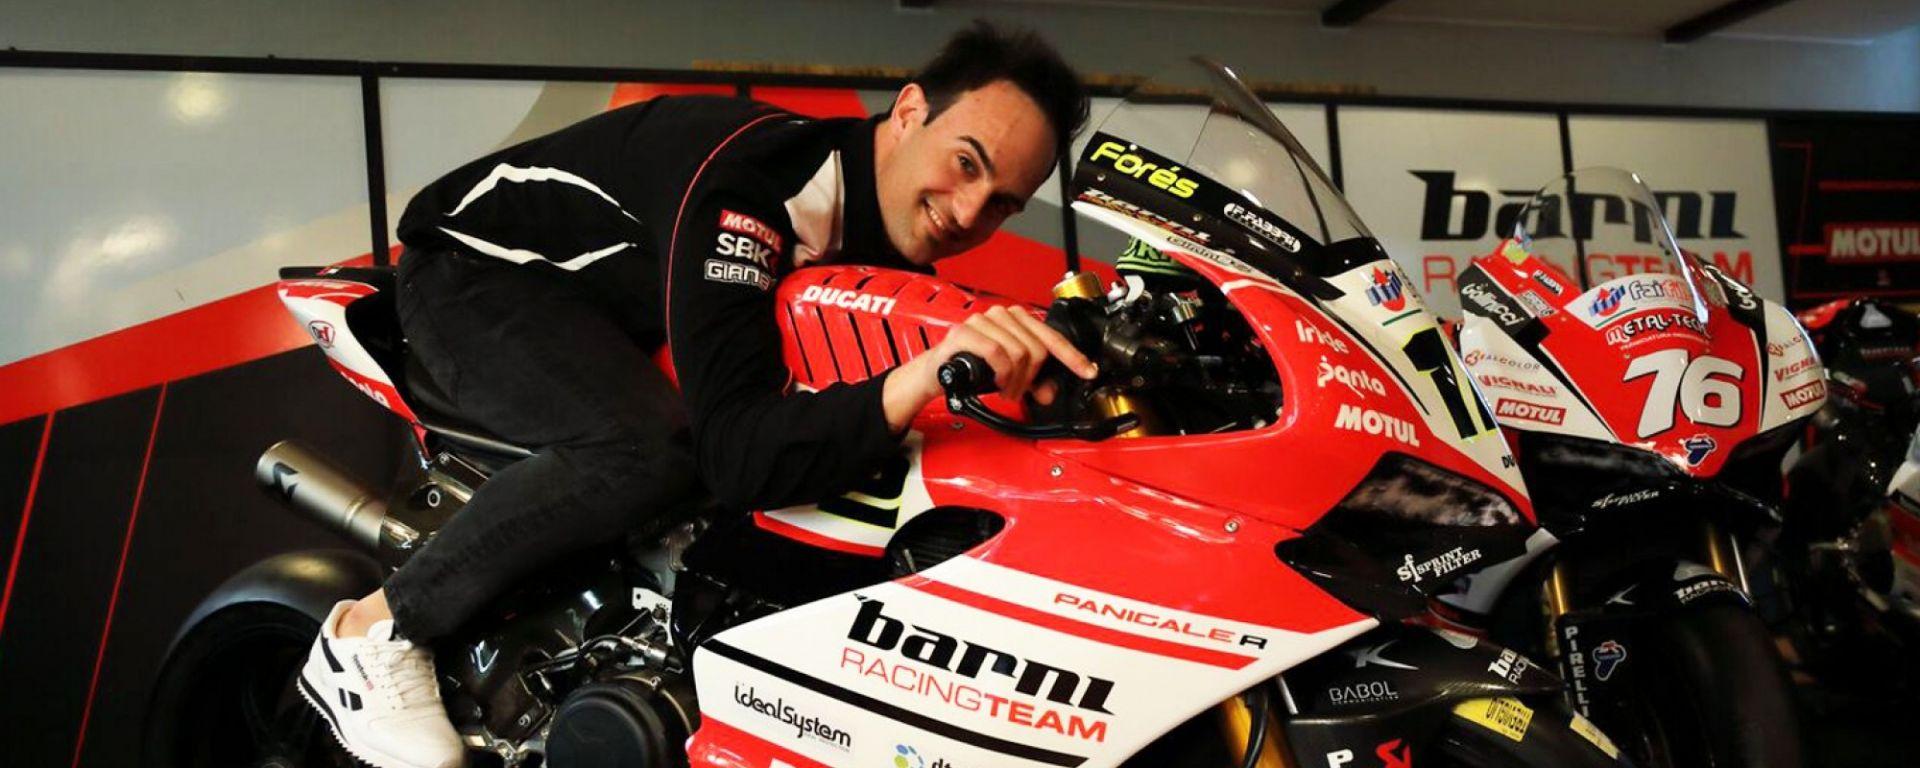 Barni Racing Team